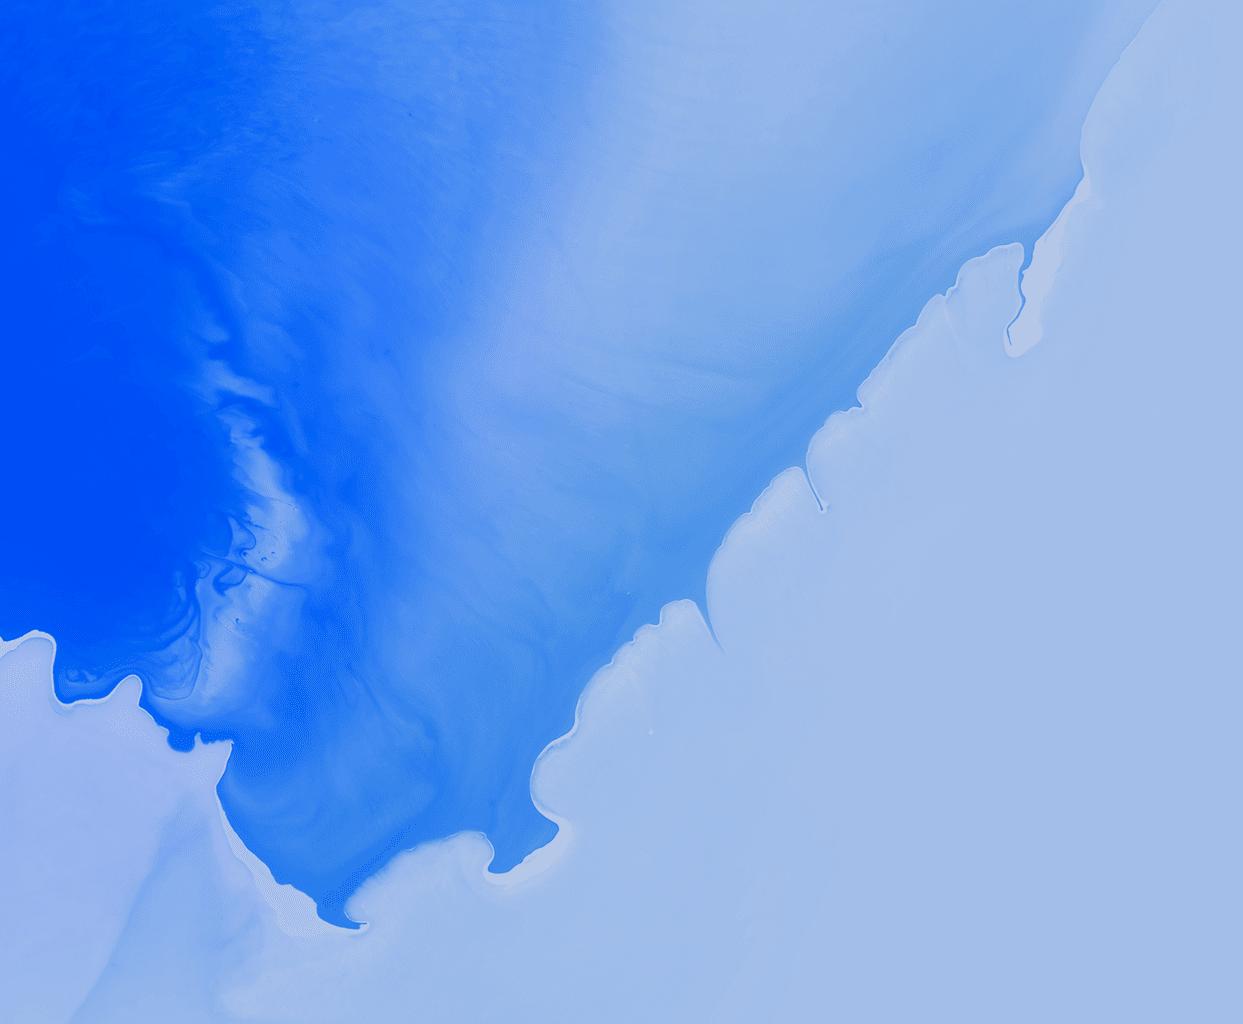 Pixel 3 Wallpapers - Wallpaper Cave